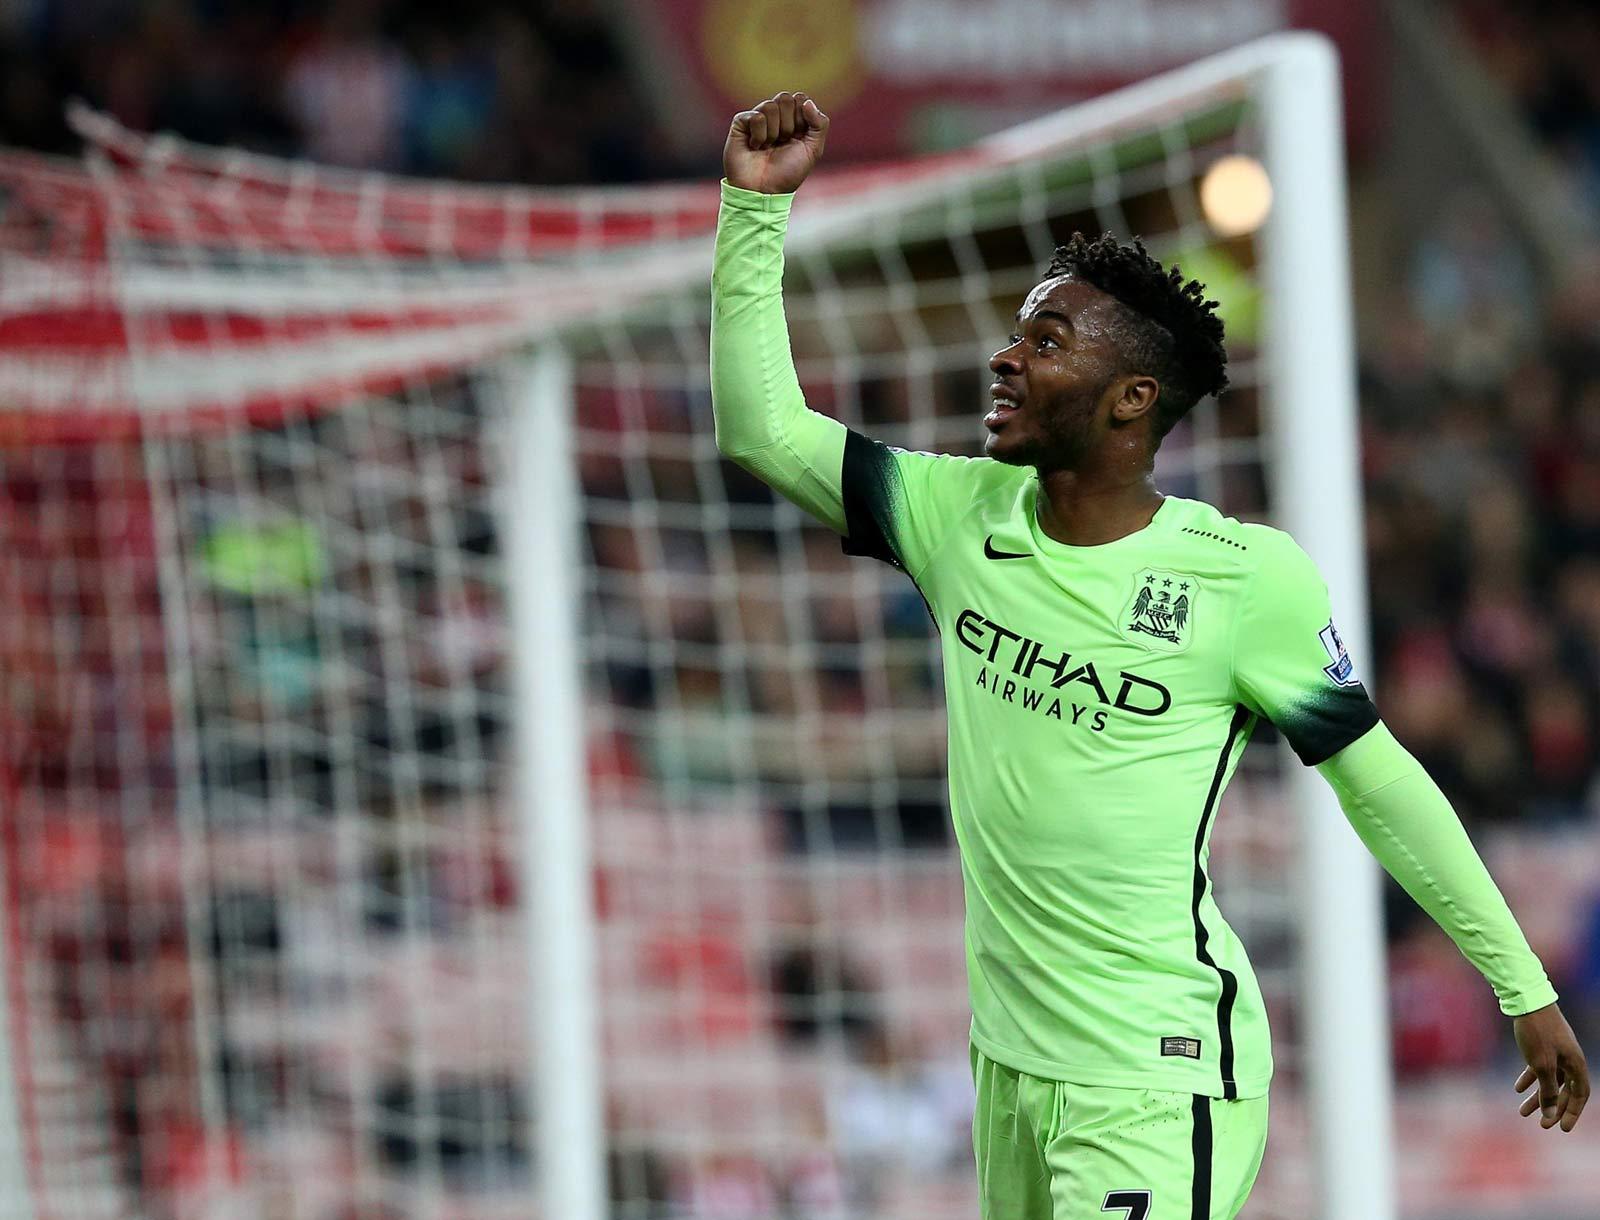 bd4c6f5522f Manchester City 15-16 Third Kit - On-pitch Debut - Sports kicks